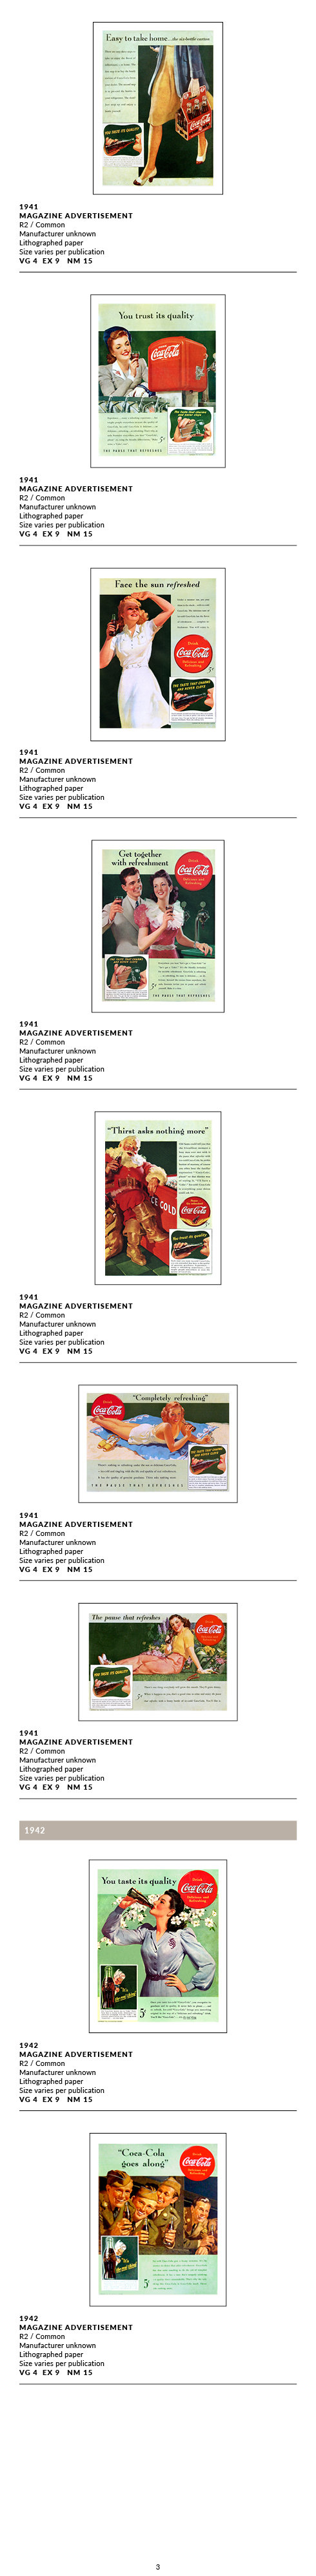 1940-45 Ads_3.jpg